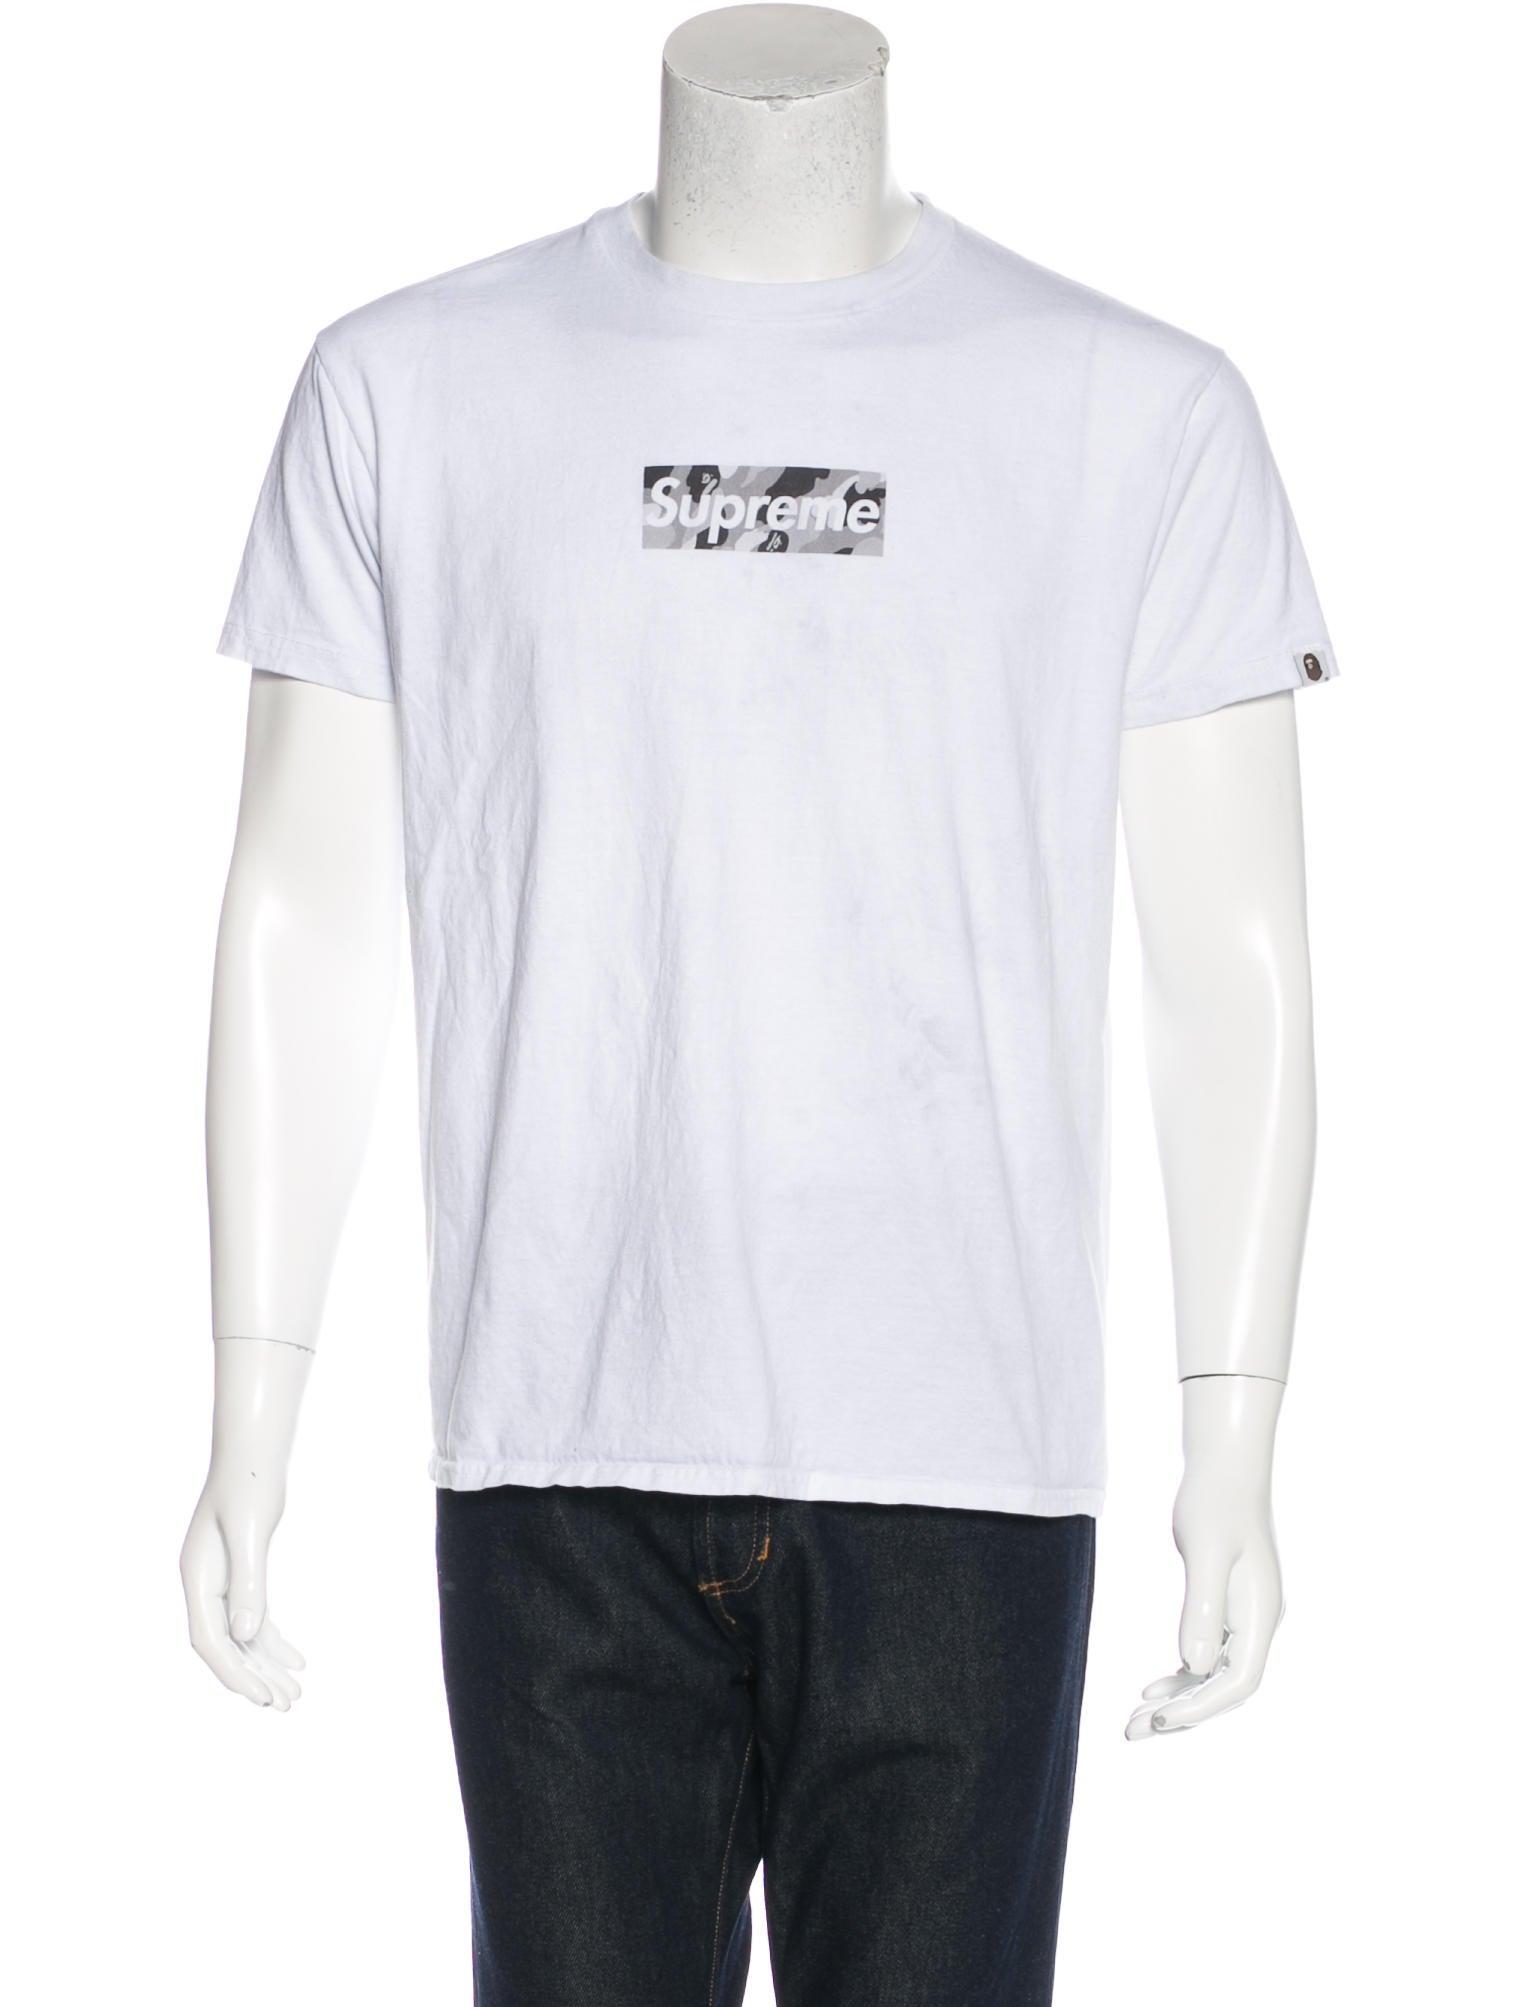 4354ac5aa405 Supreme x Bape Box Logo T-Shirt - Clothing - WSPME20460